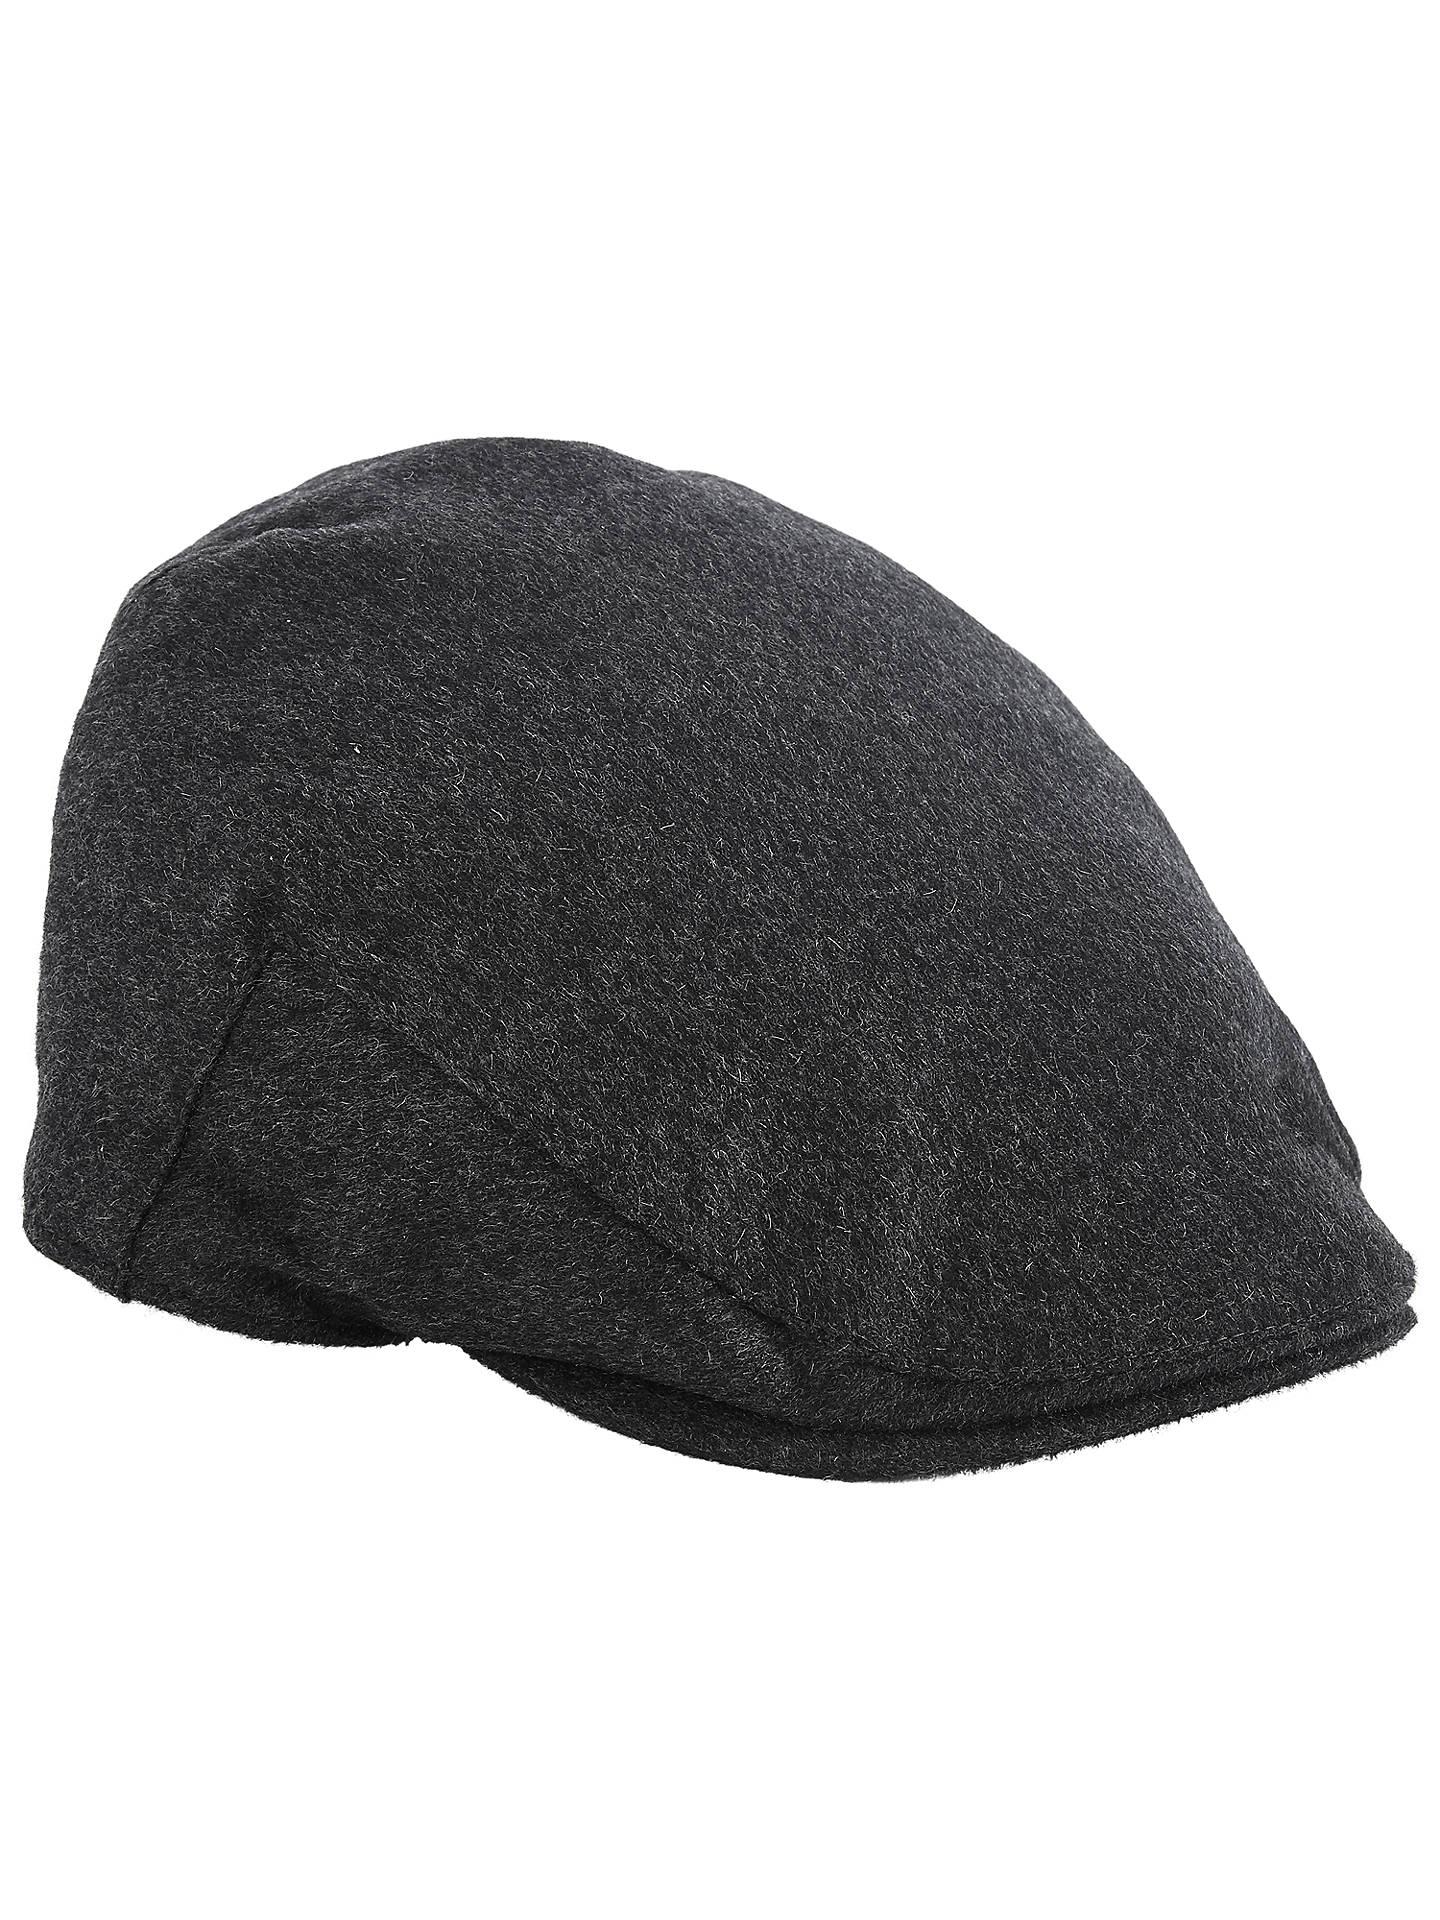 912a87da034 Buy Christys  Balmoral Cashmere Flat Cap